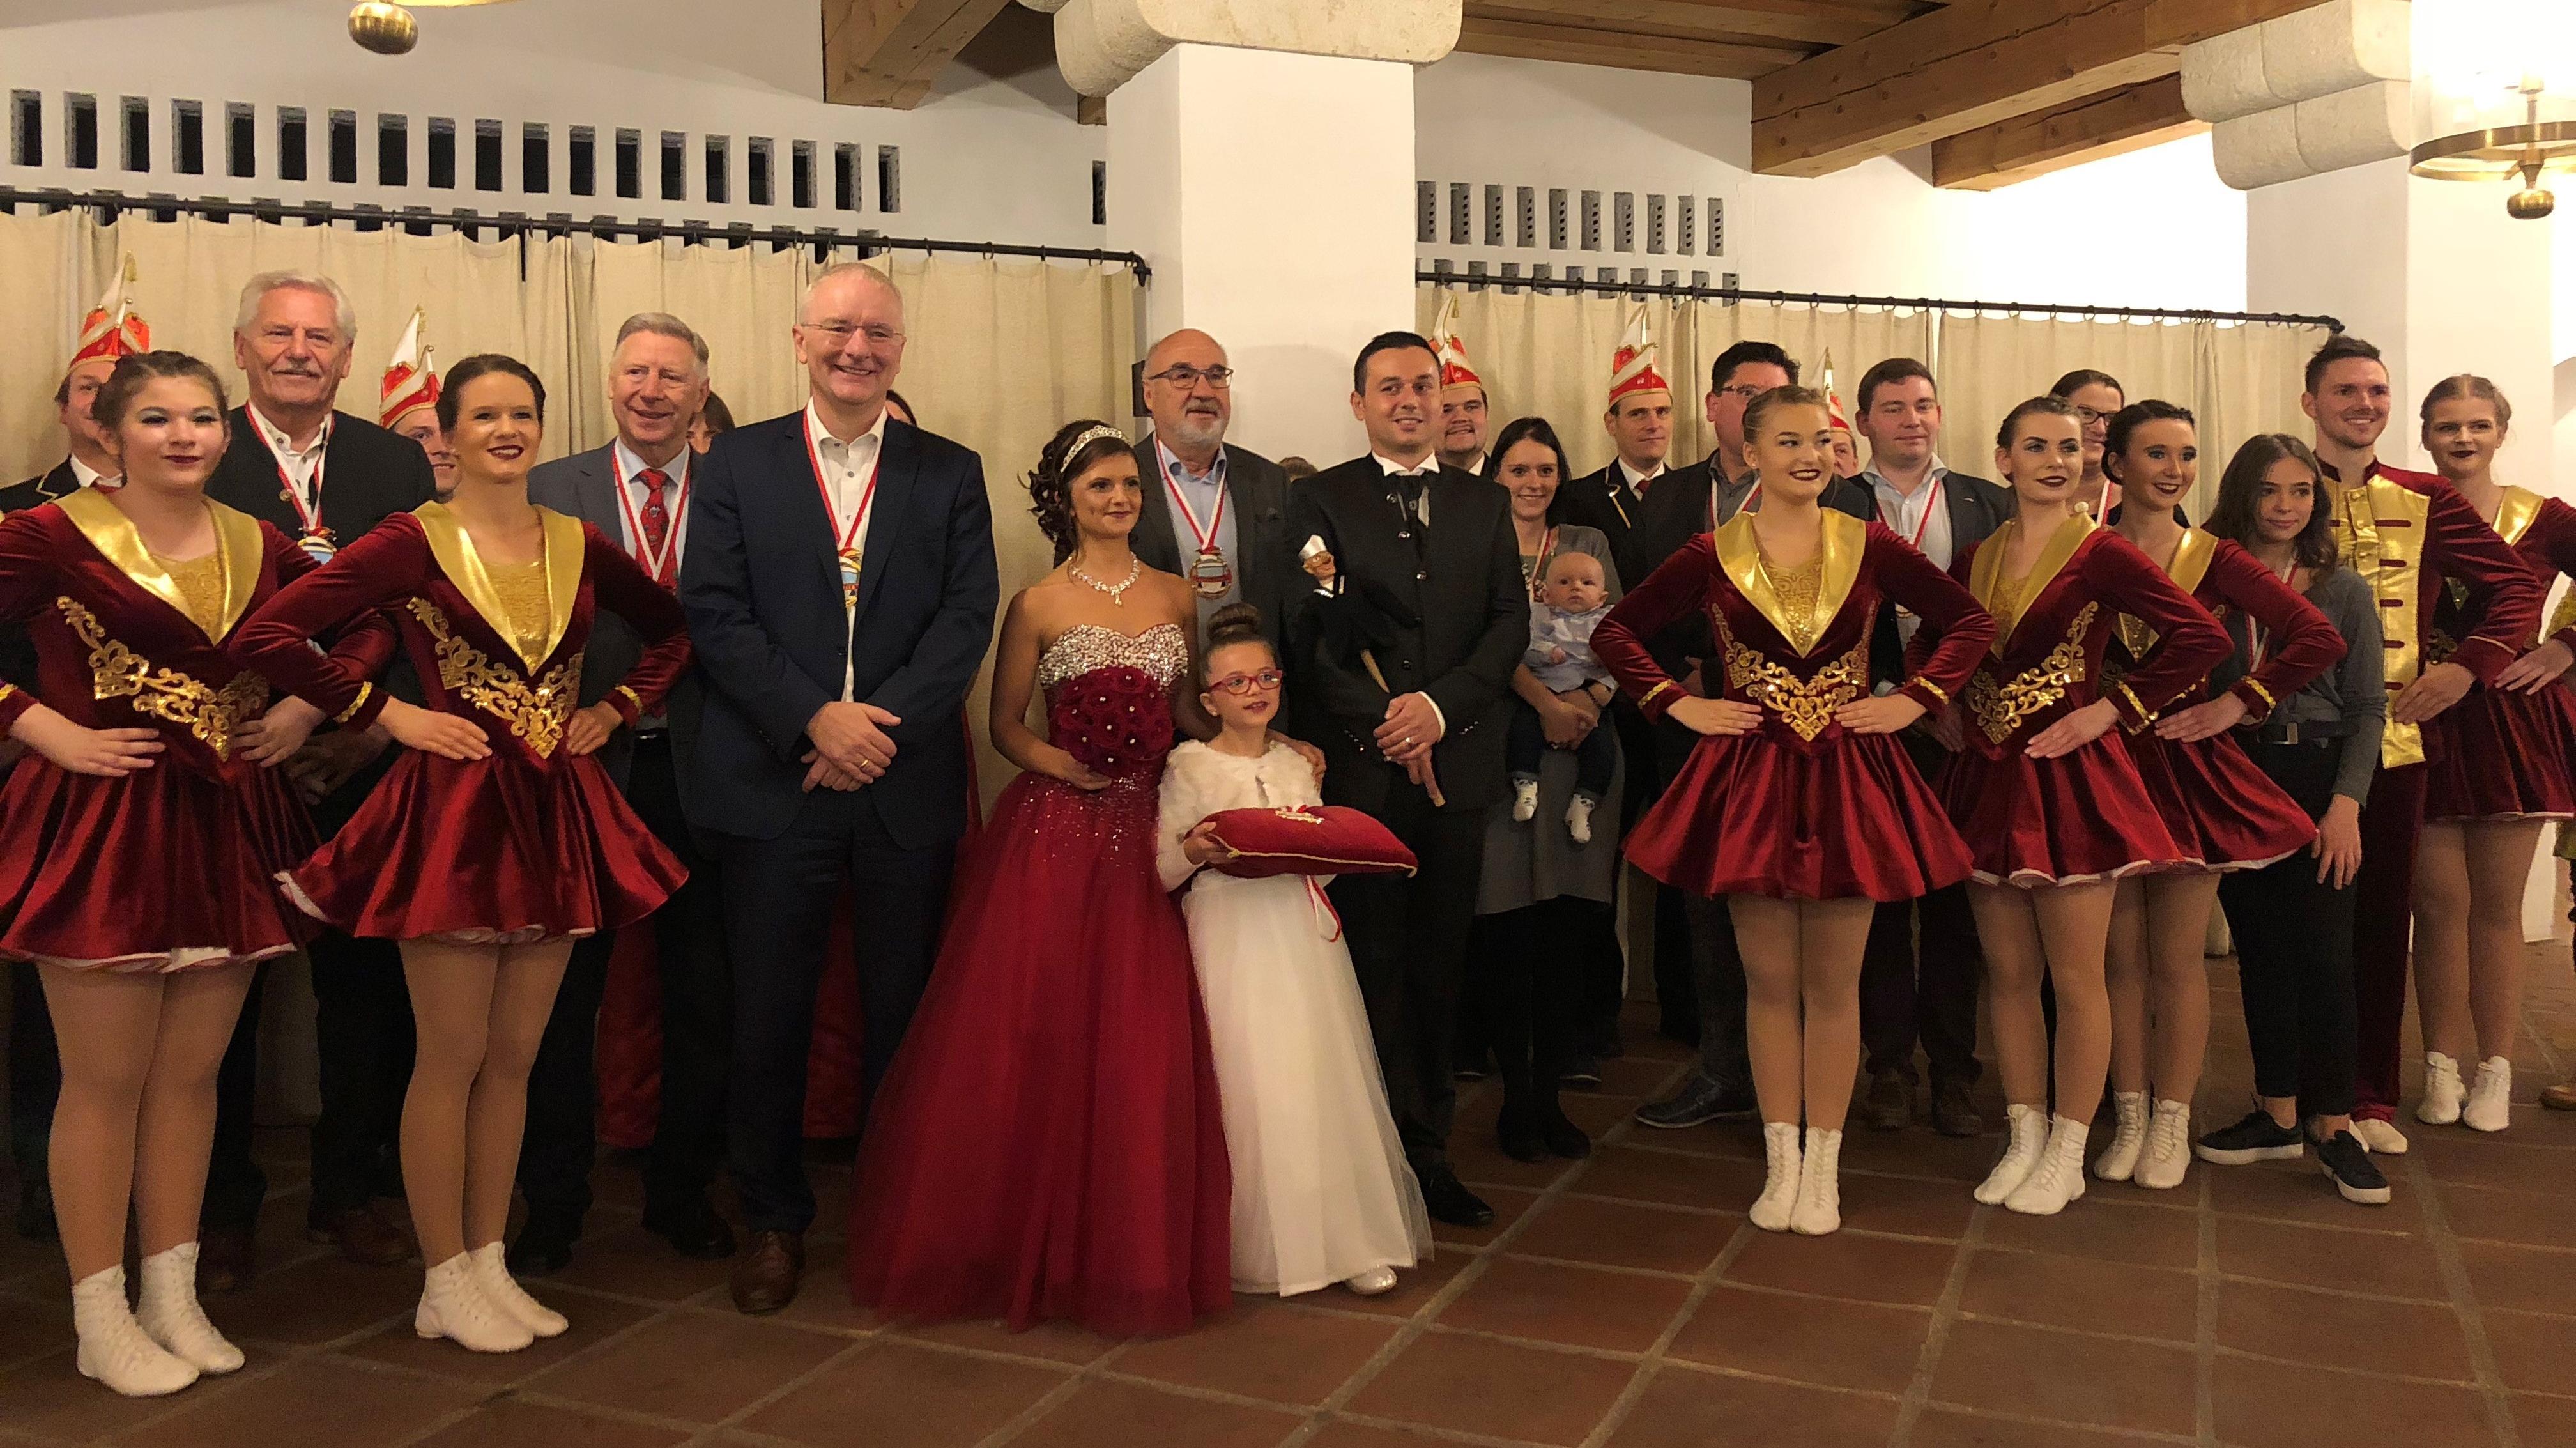 Oberbürgermeister Alexander Putz mit der Landshuter Faschingsgesellschaft beim verfrühten Faschingsstart